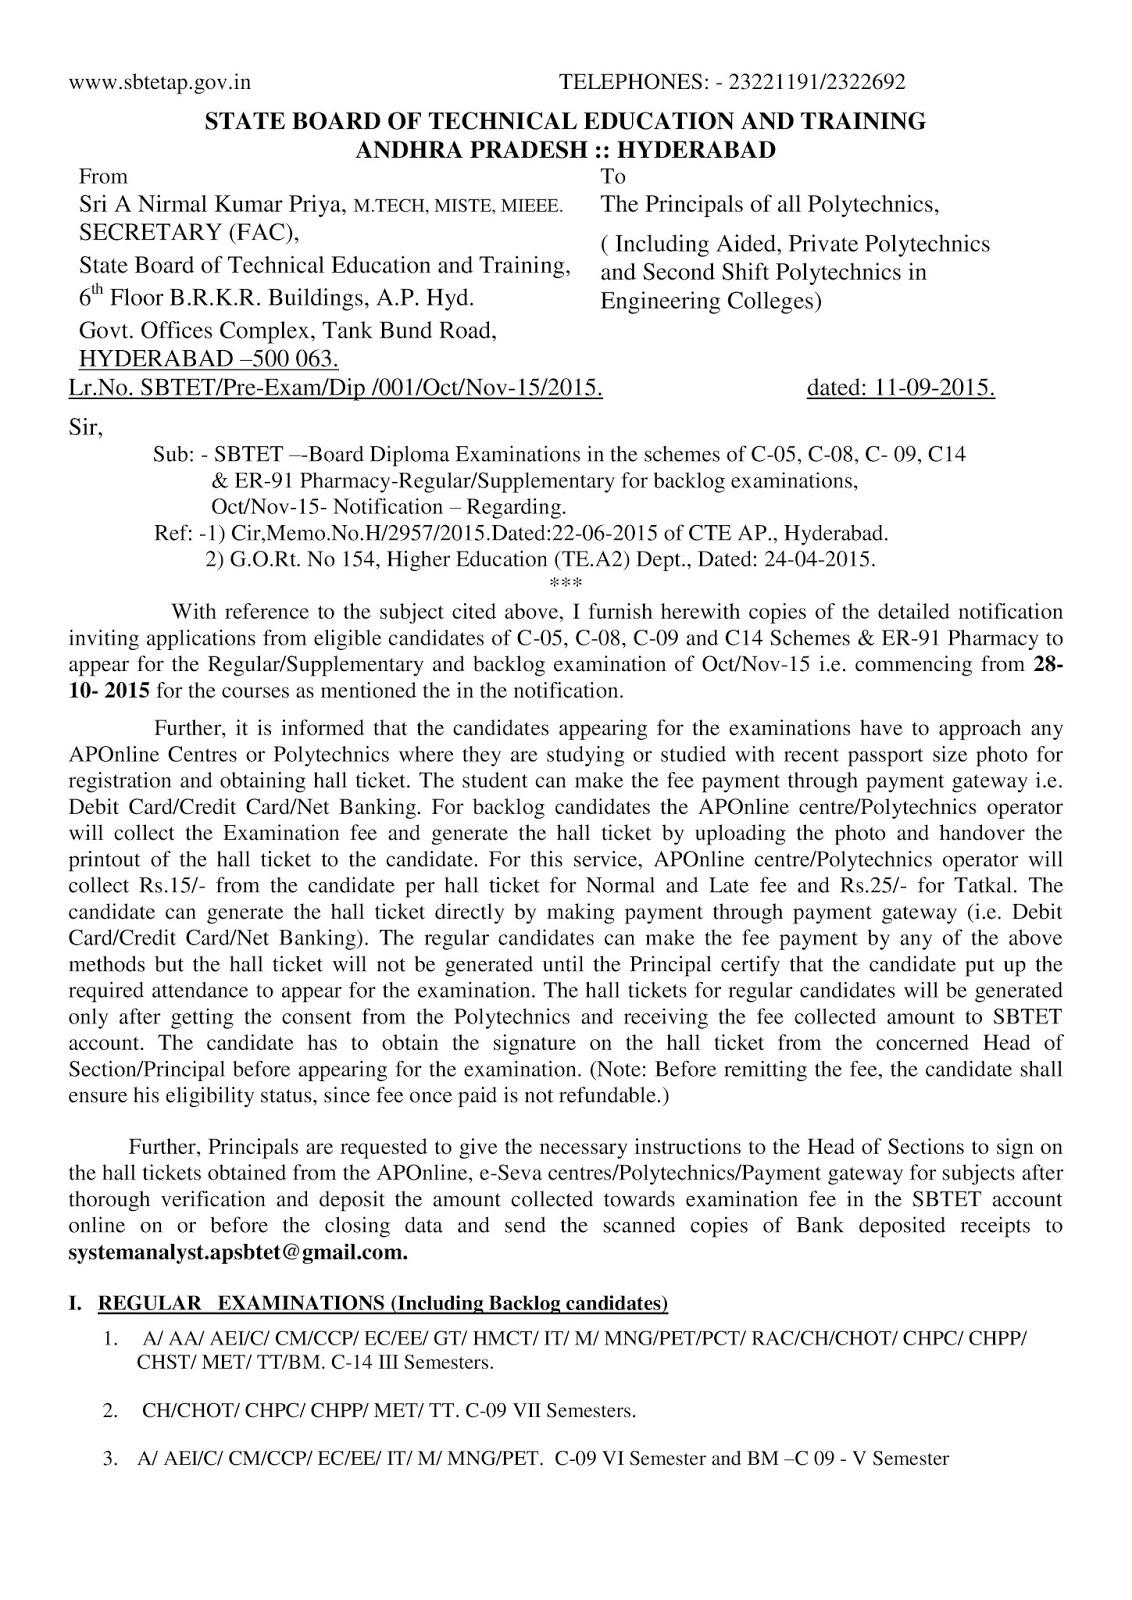 Andhra Pradesh  Diploma Examination Fee Notification - Oct/Nov-2015